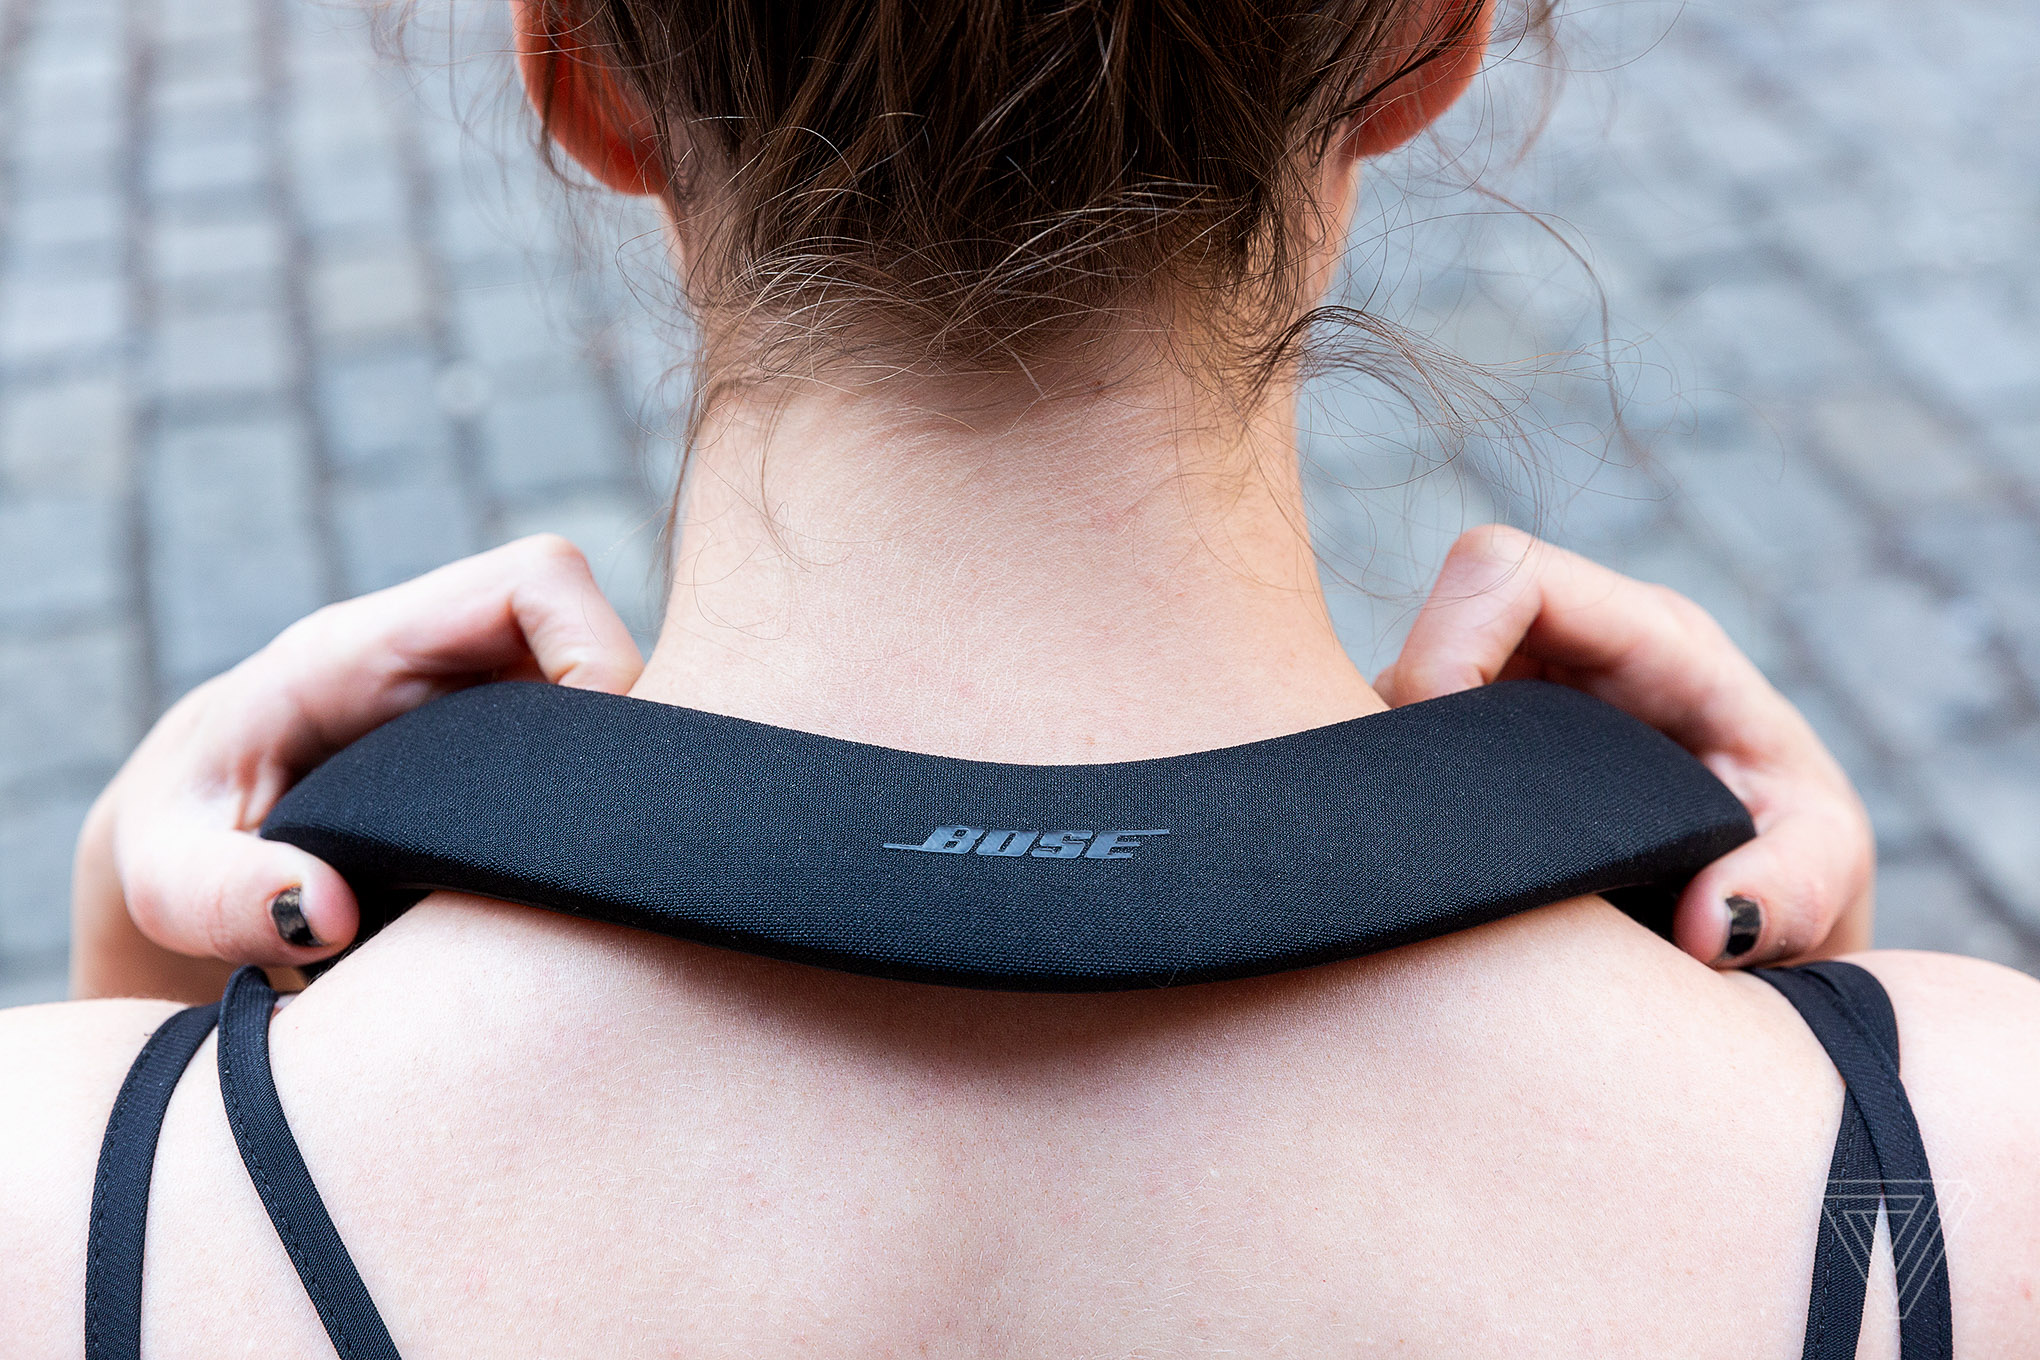 Bose Soundwear Companion Neck Speaker Review The Verge